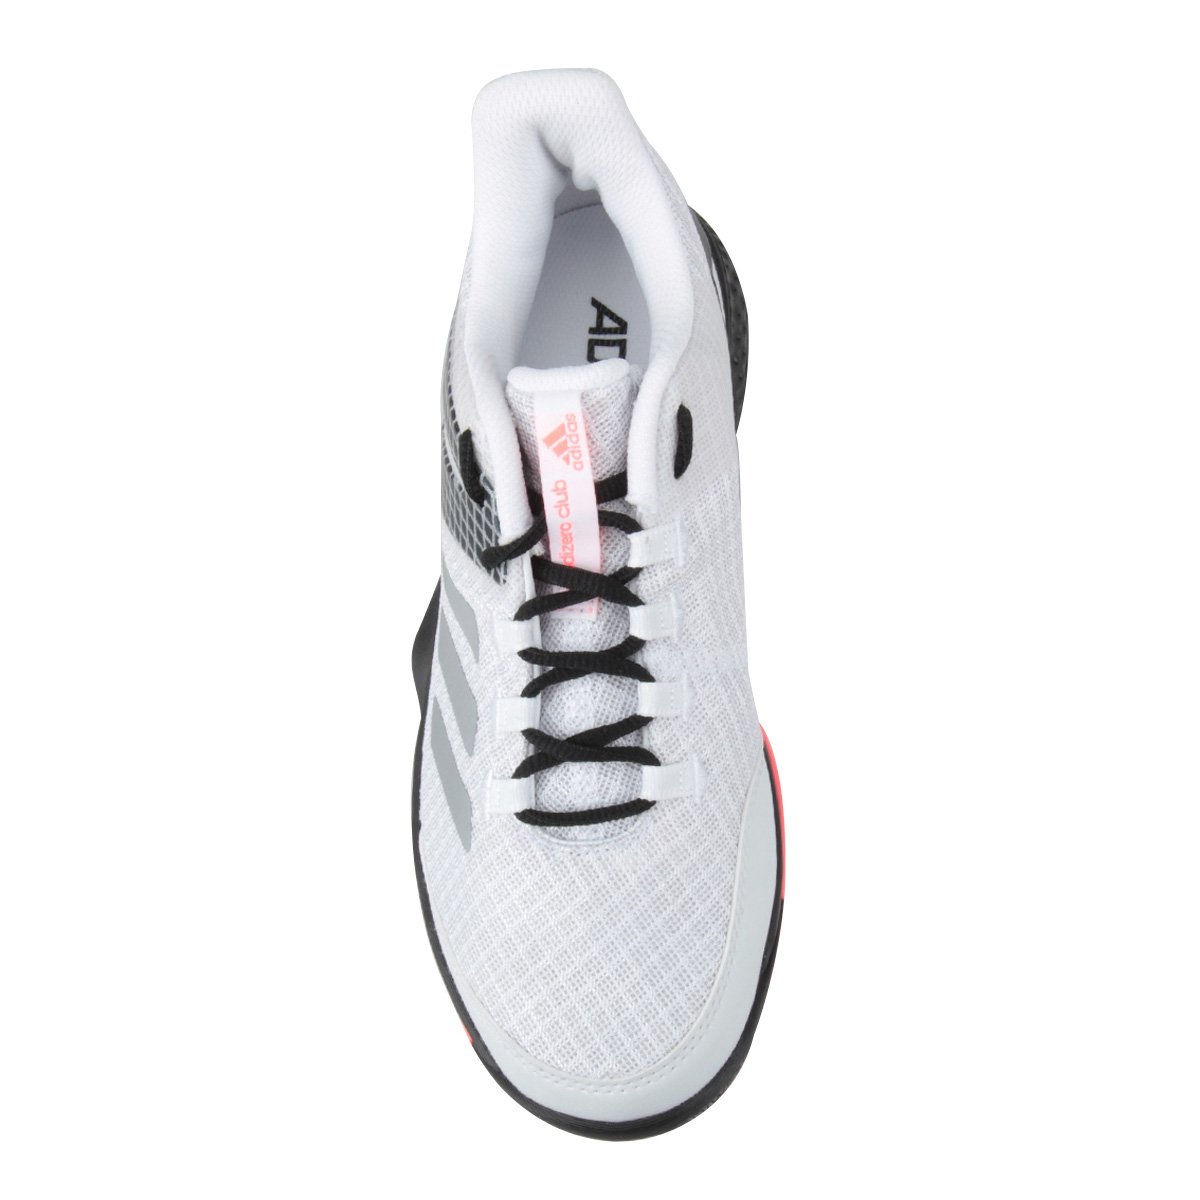 Tênis Adidas Adizero Club 2 Masculino - Branco e Cinza - Compre ... 0b7160f55ae9a